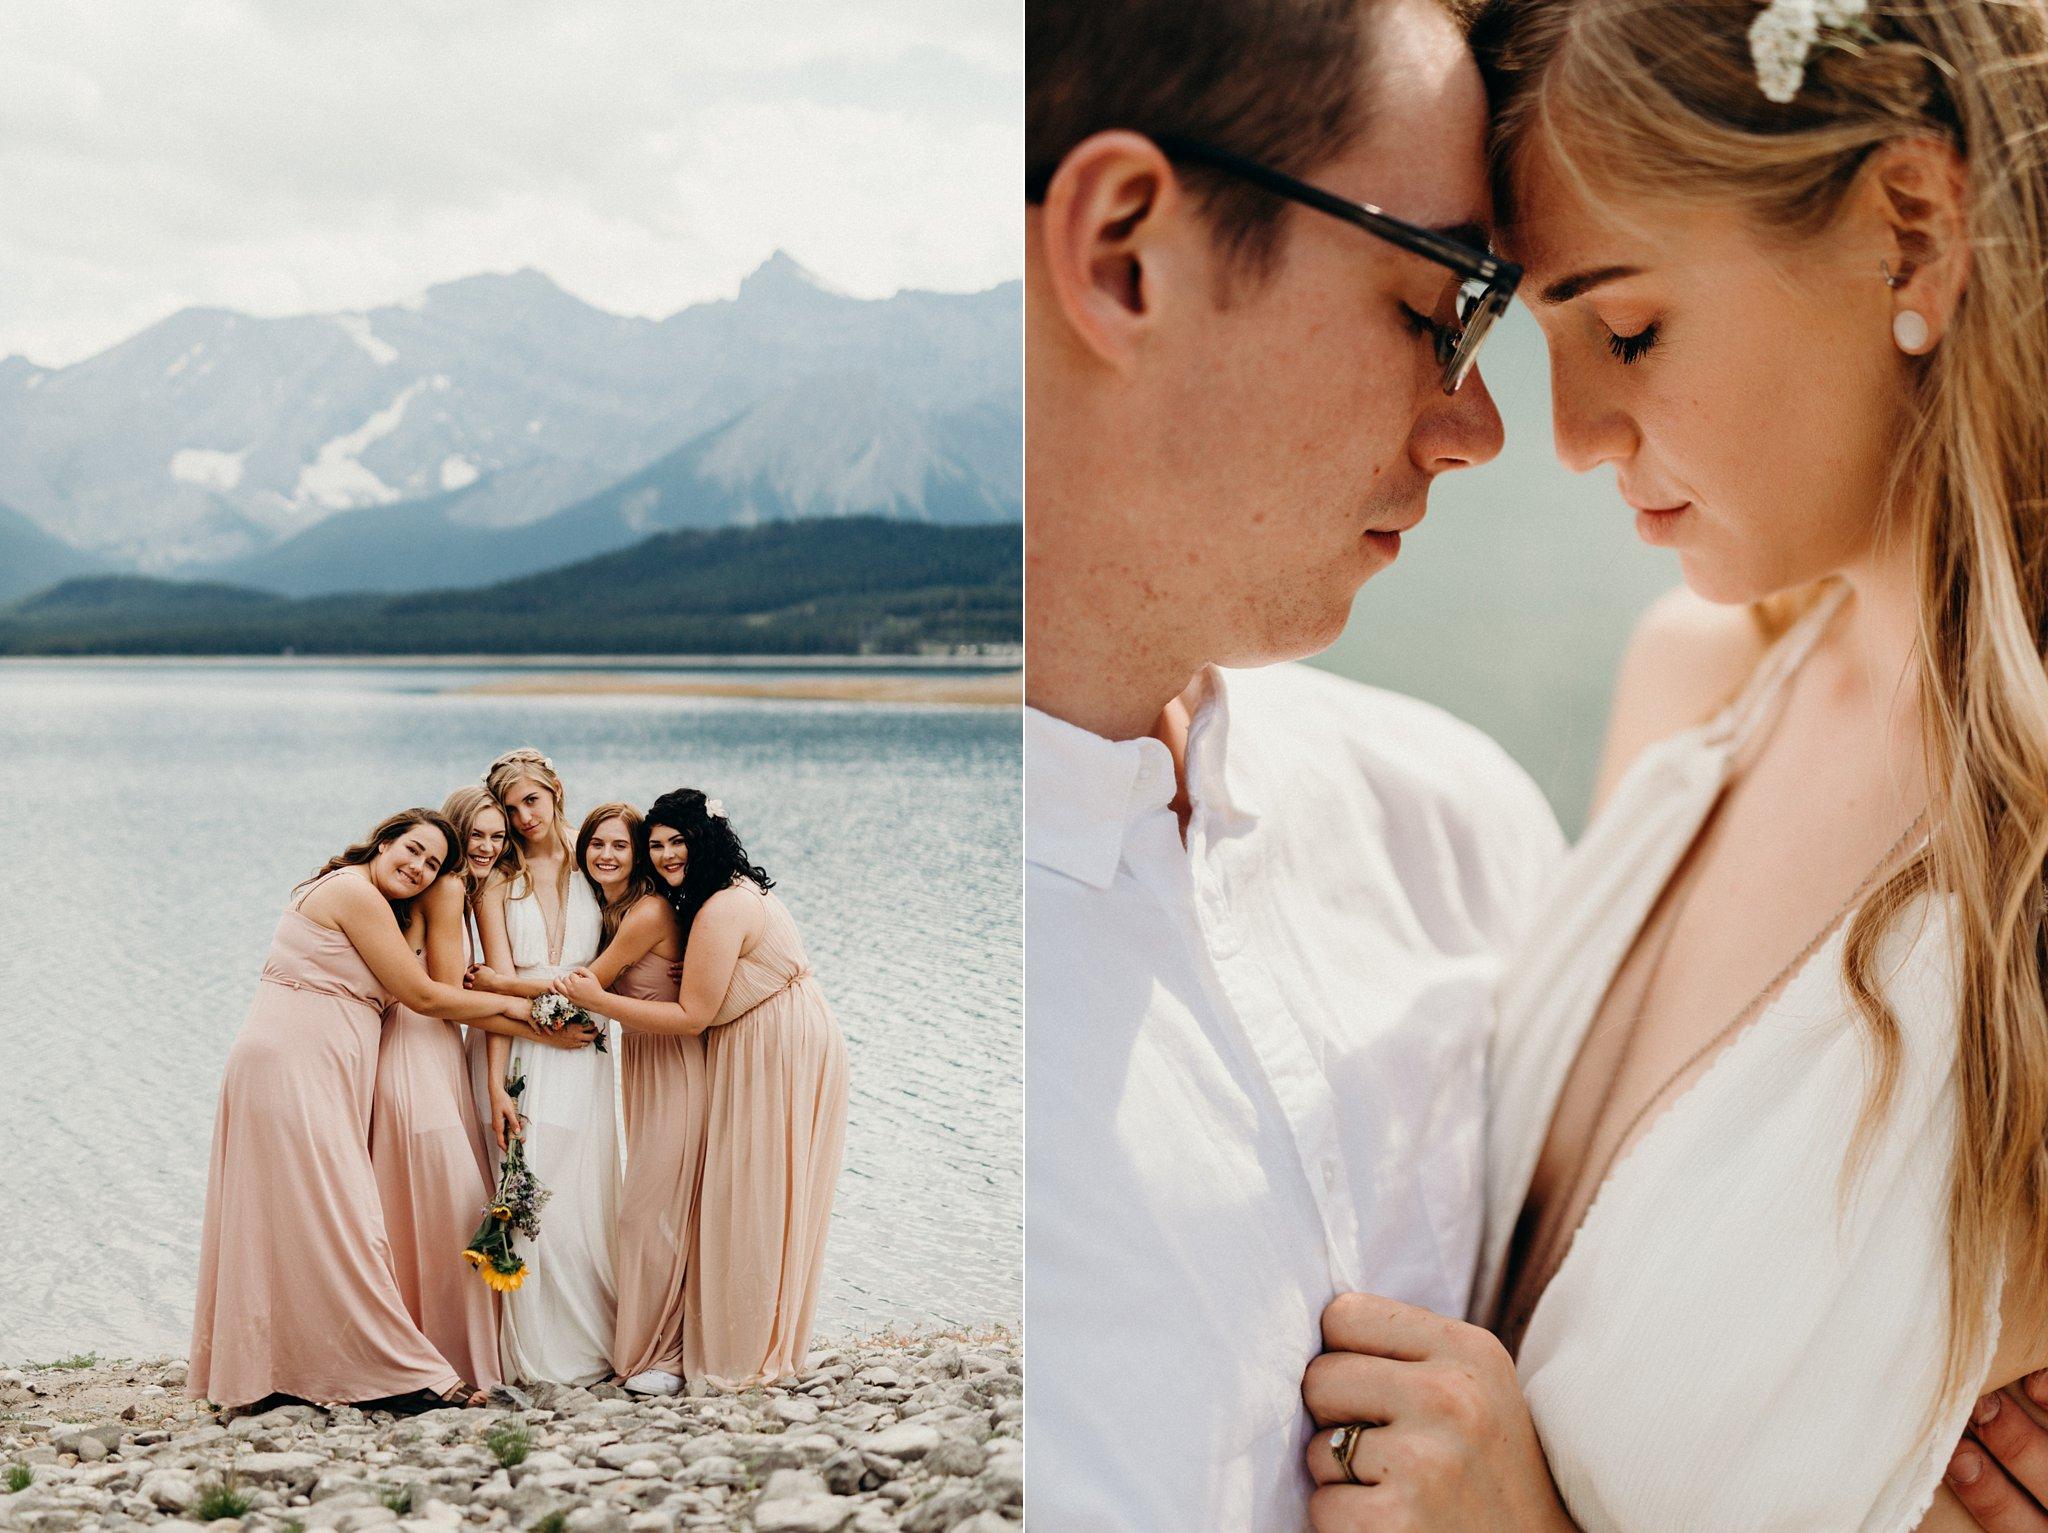 kaihla_tonai_intimate_wedding_elopement_photographer_6399.jpg